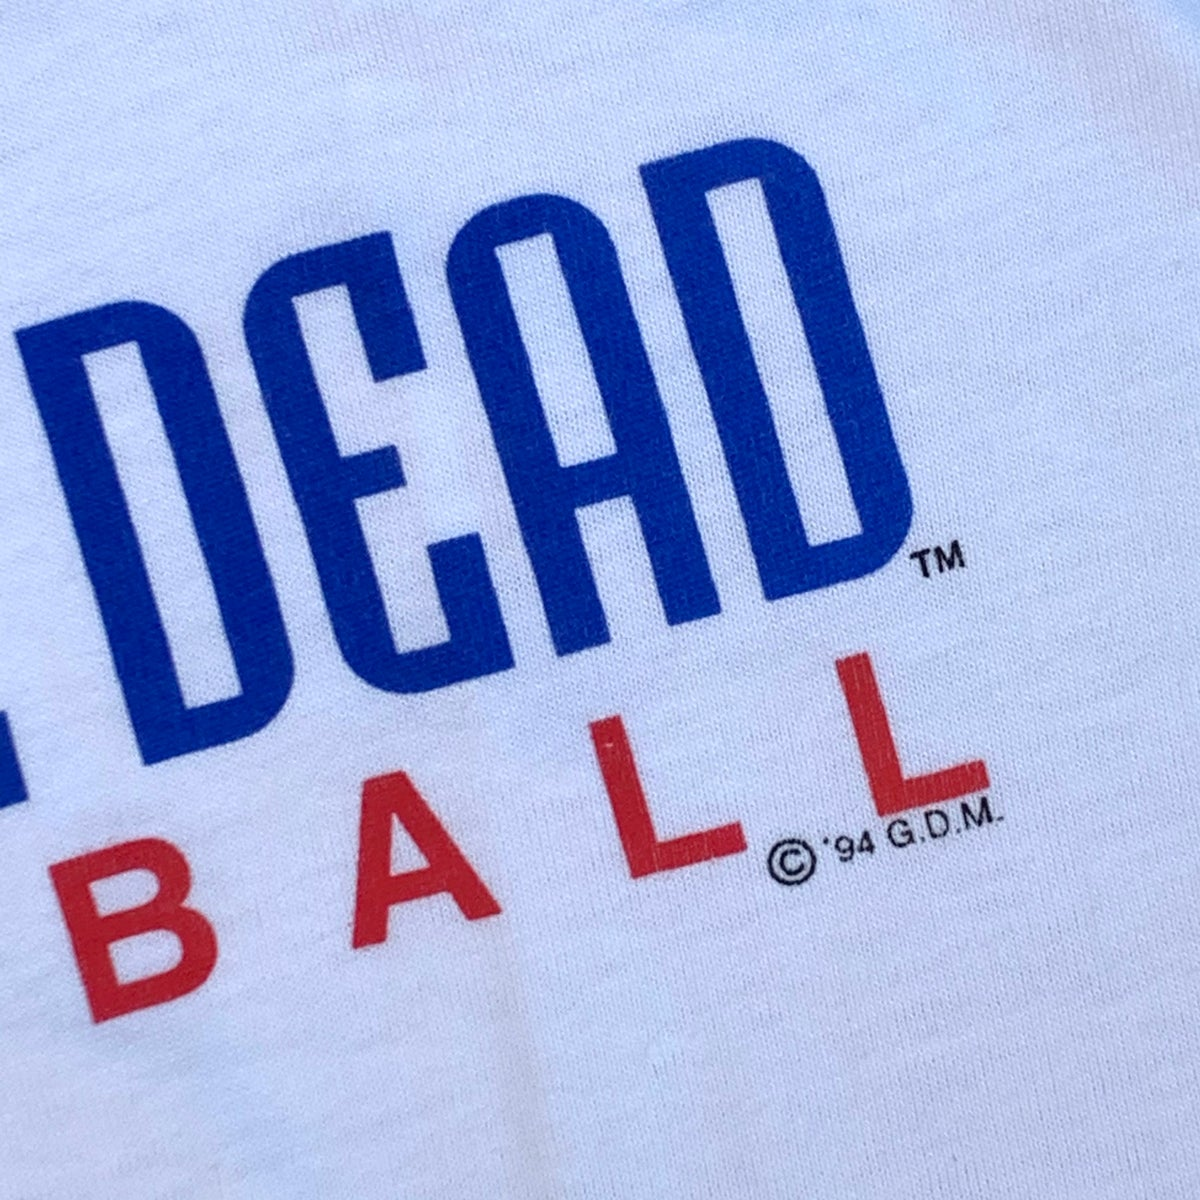 Original Vintage Grateful Dead Basketball 1994 Short Sleeve Tee! LARGE